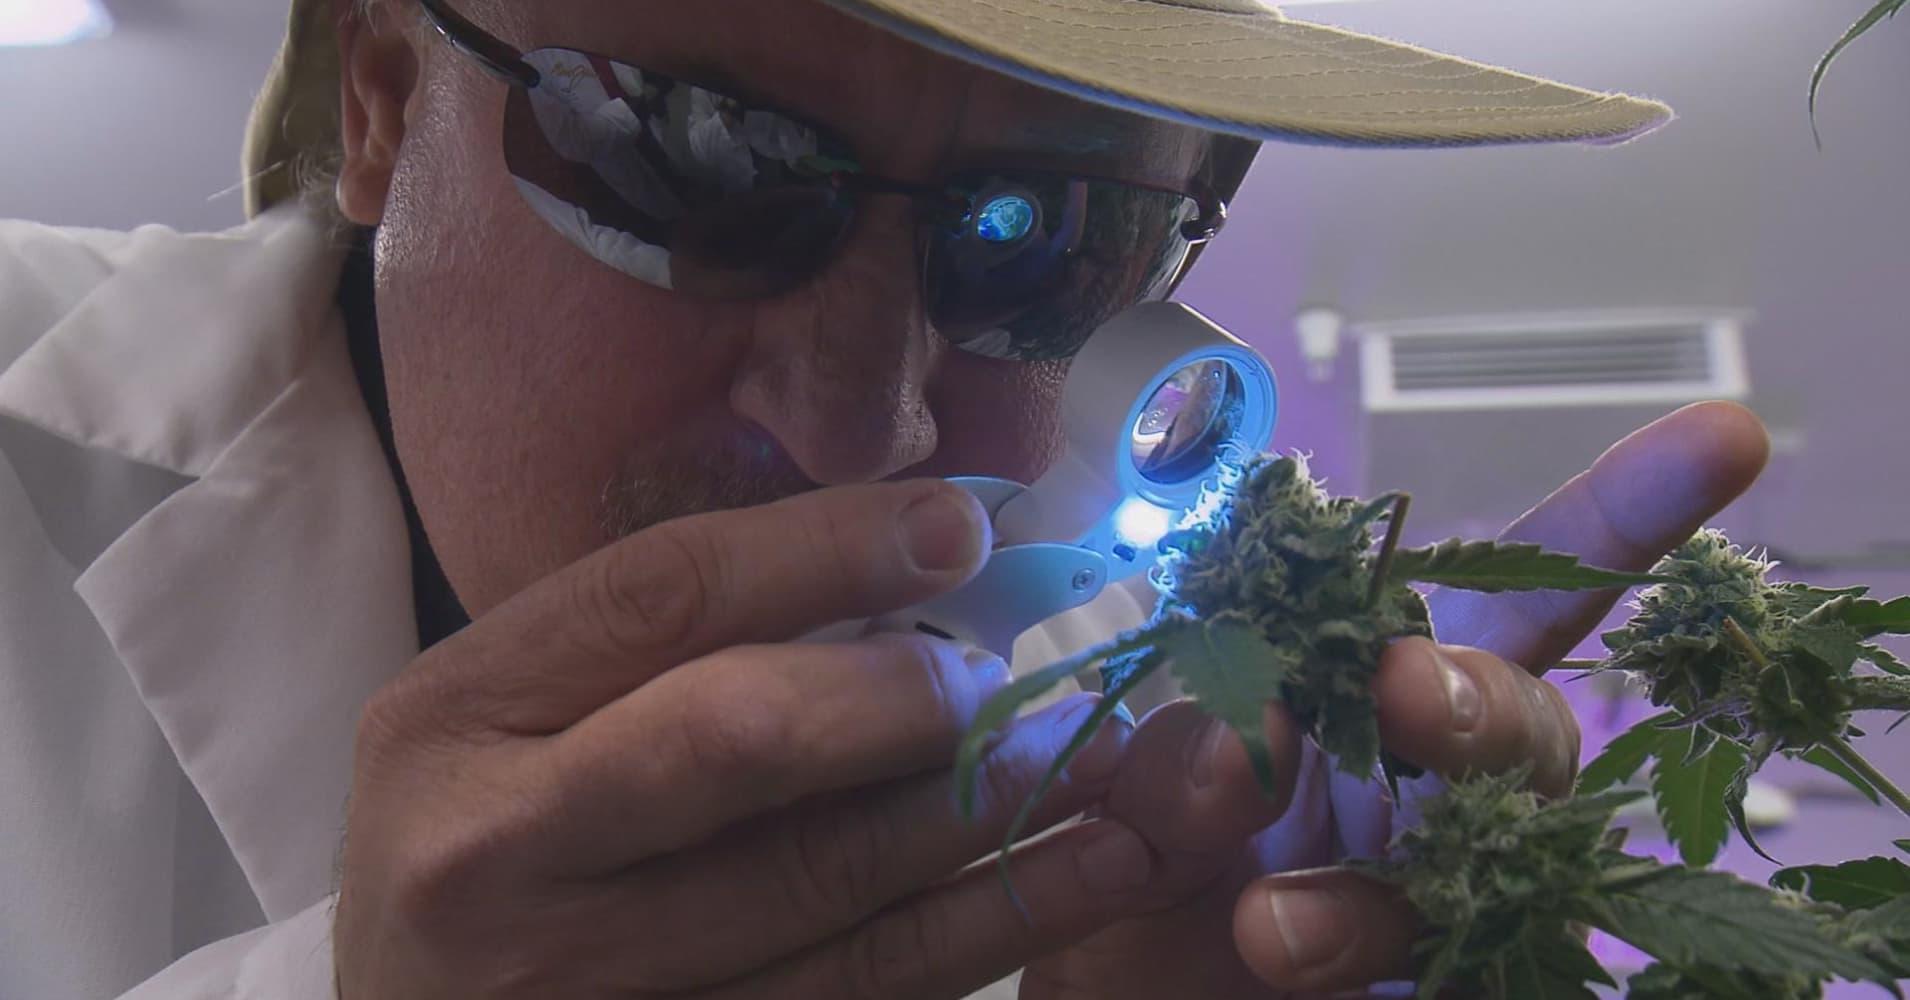 5 hot new careers created by marijuana legalization